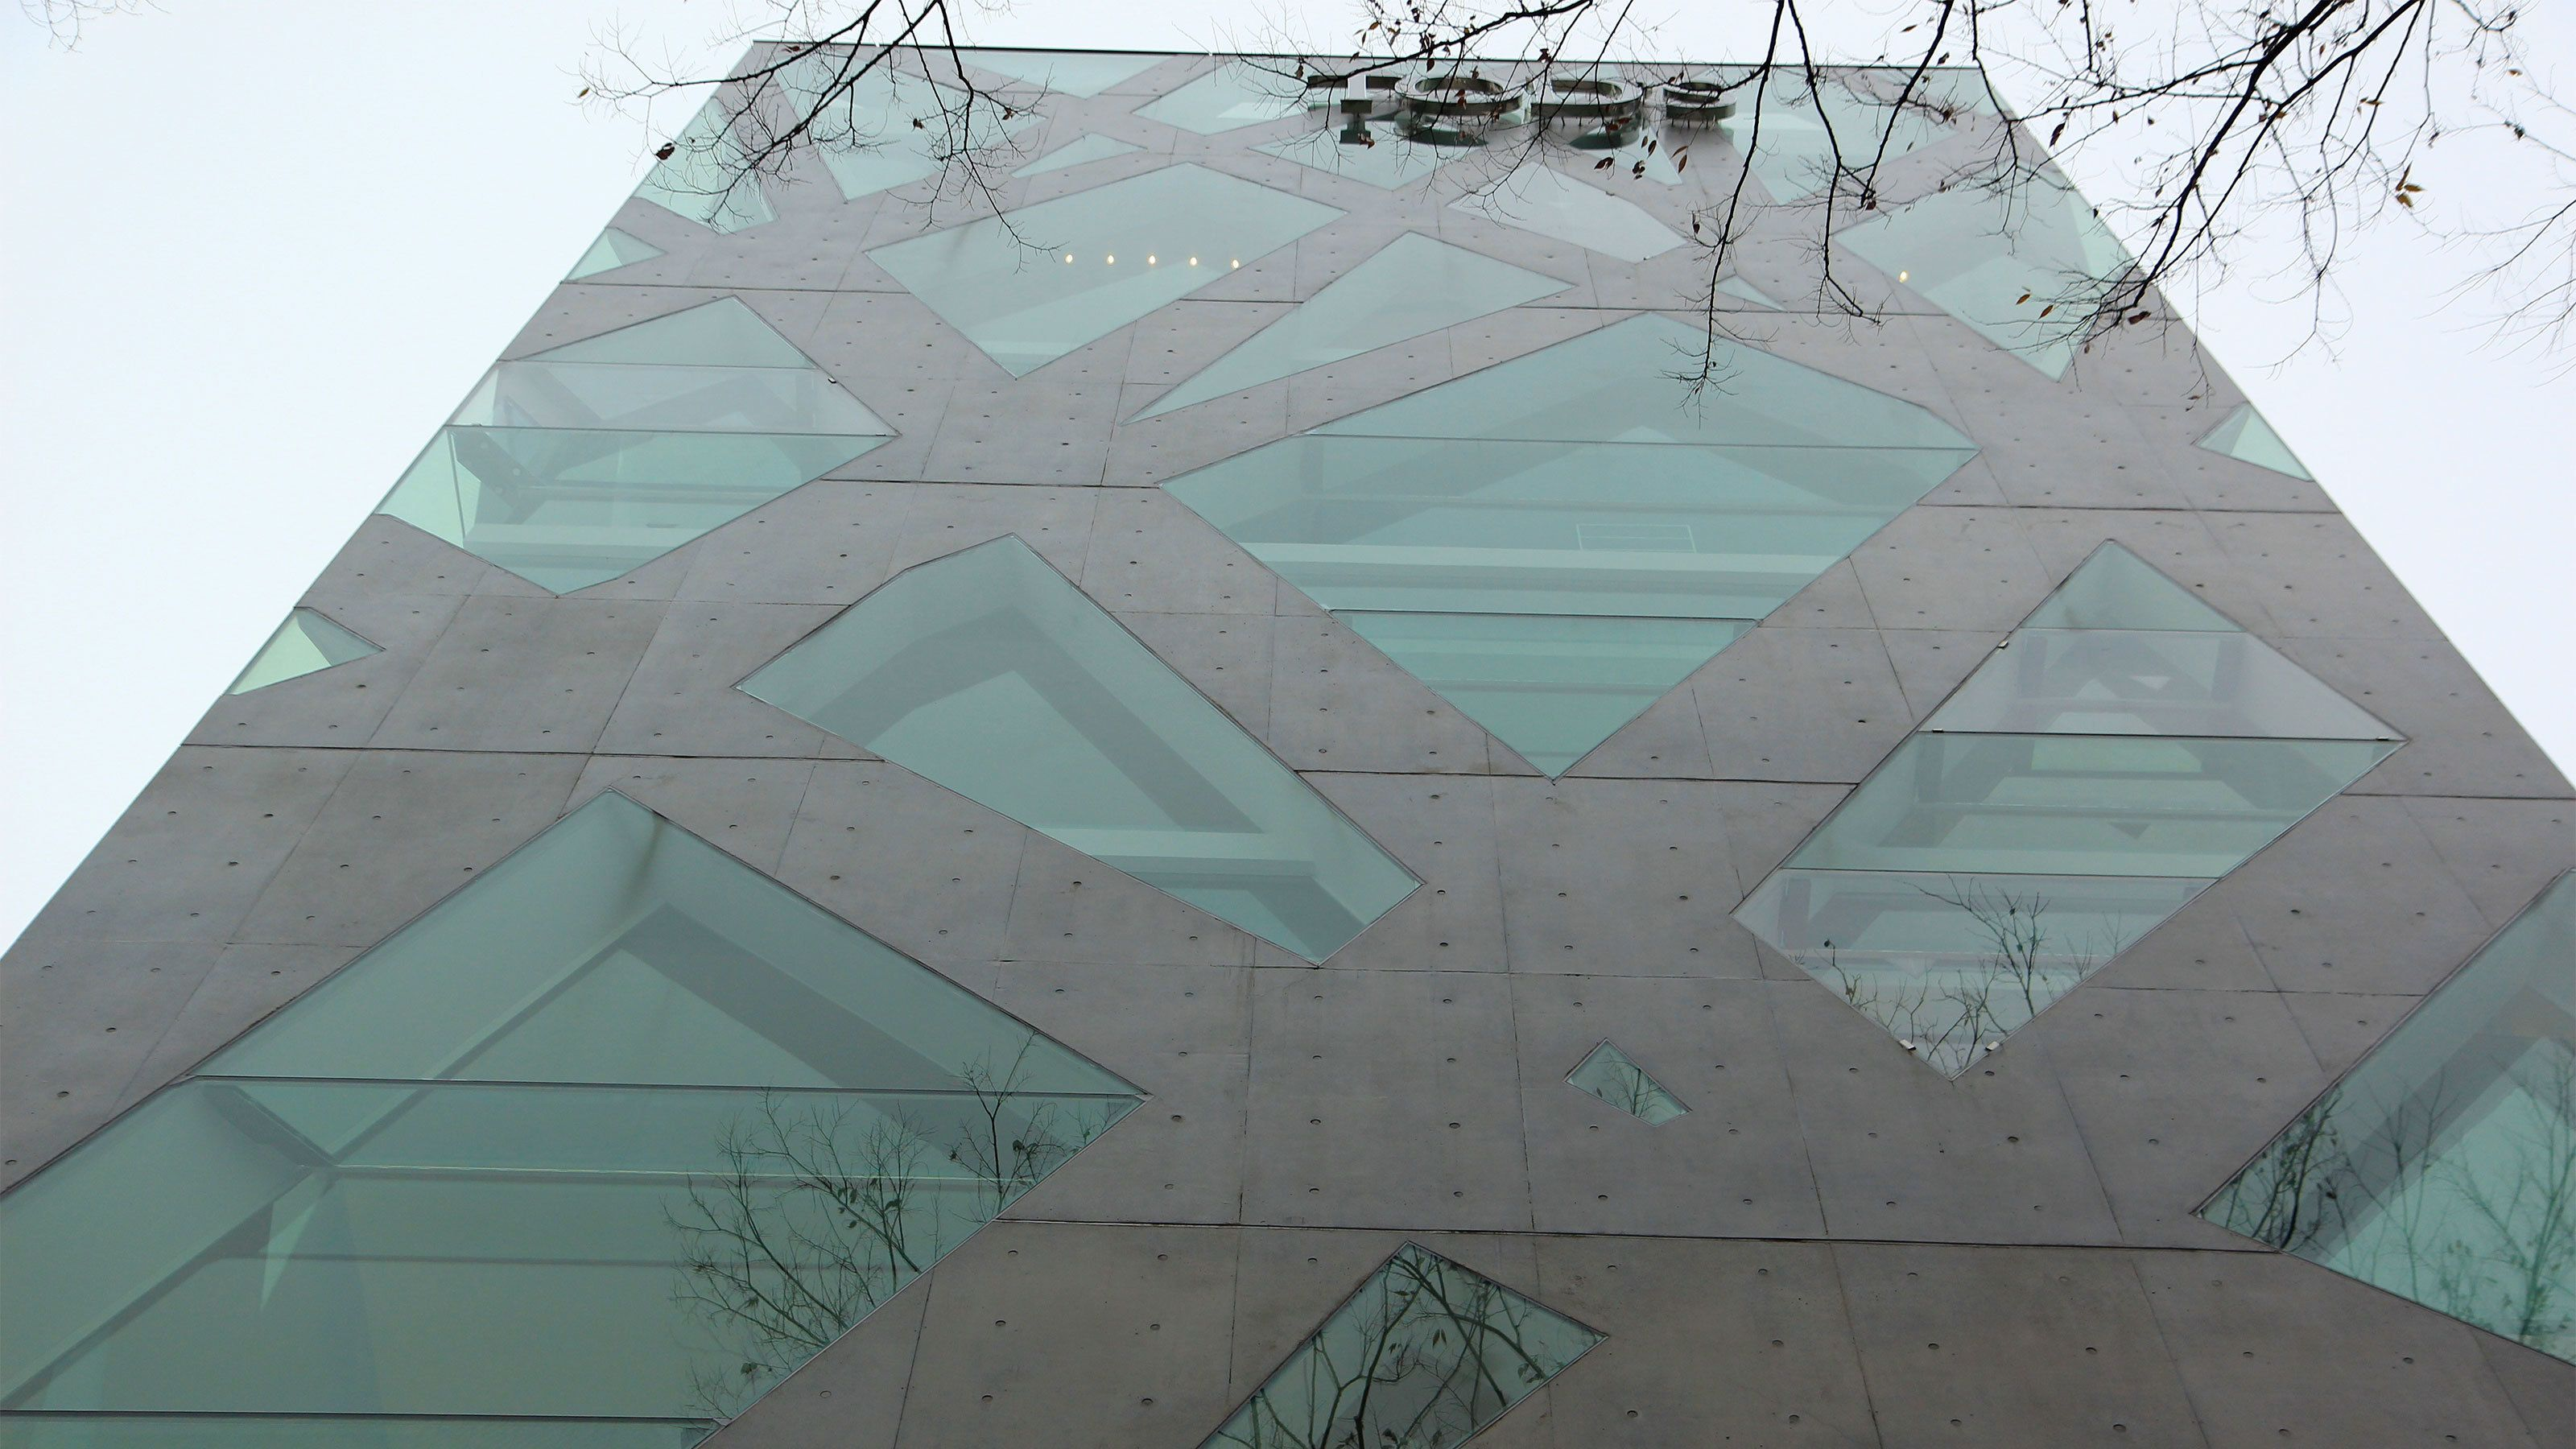 Geometric design on a skyscraper in Tokyo